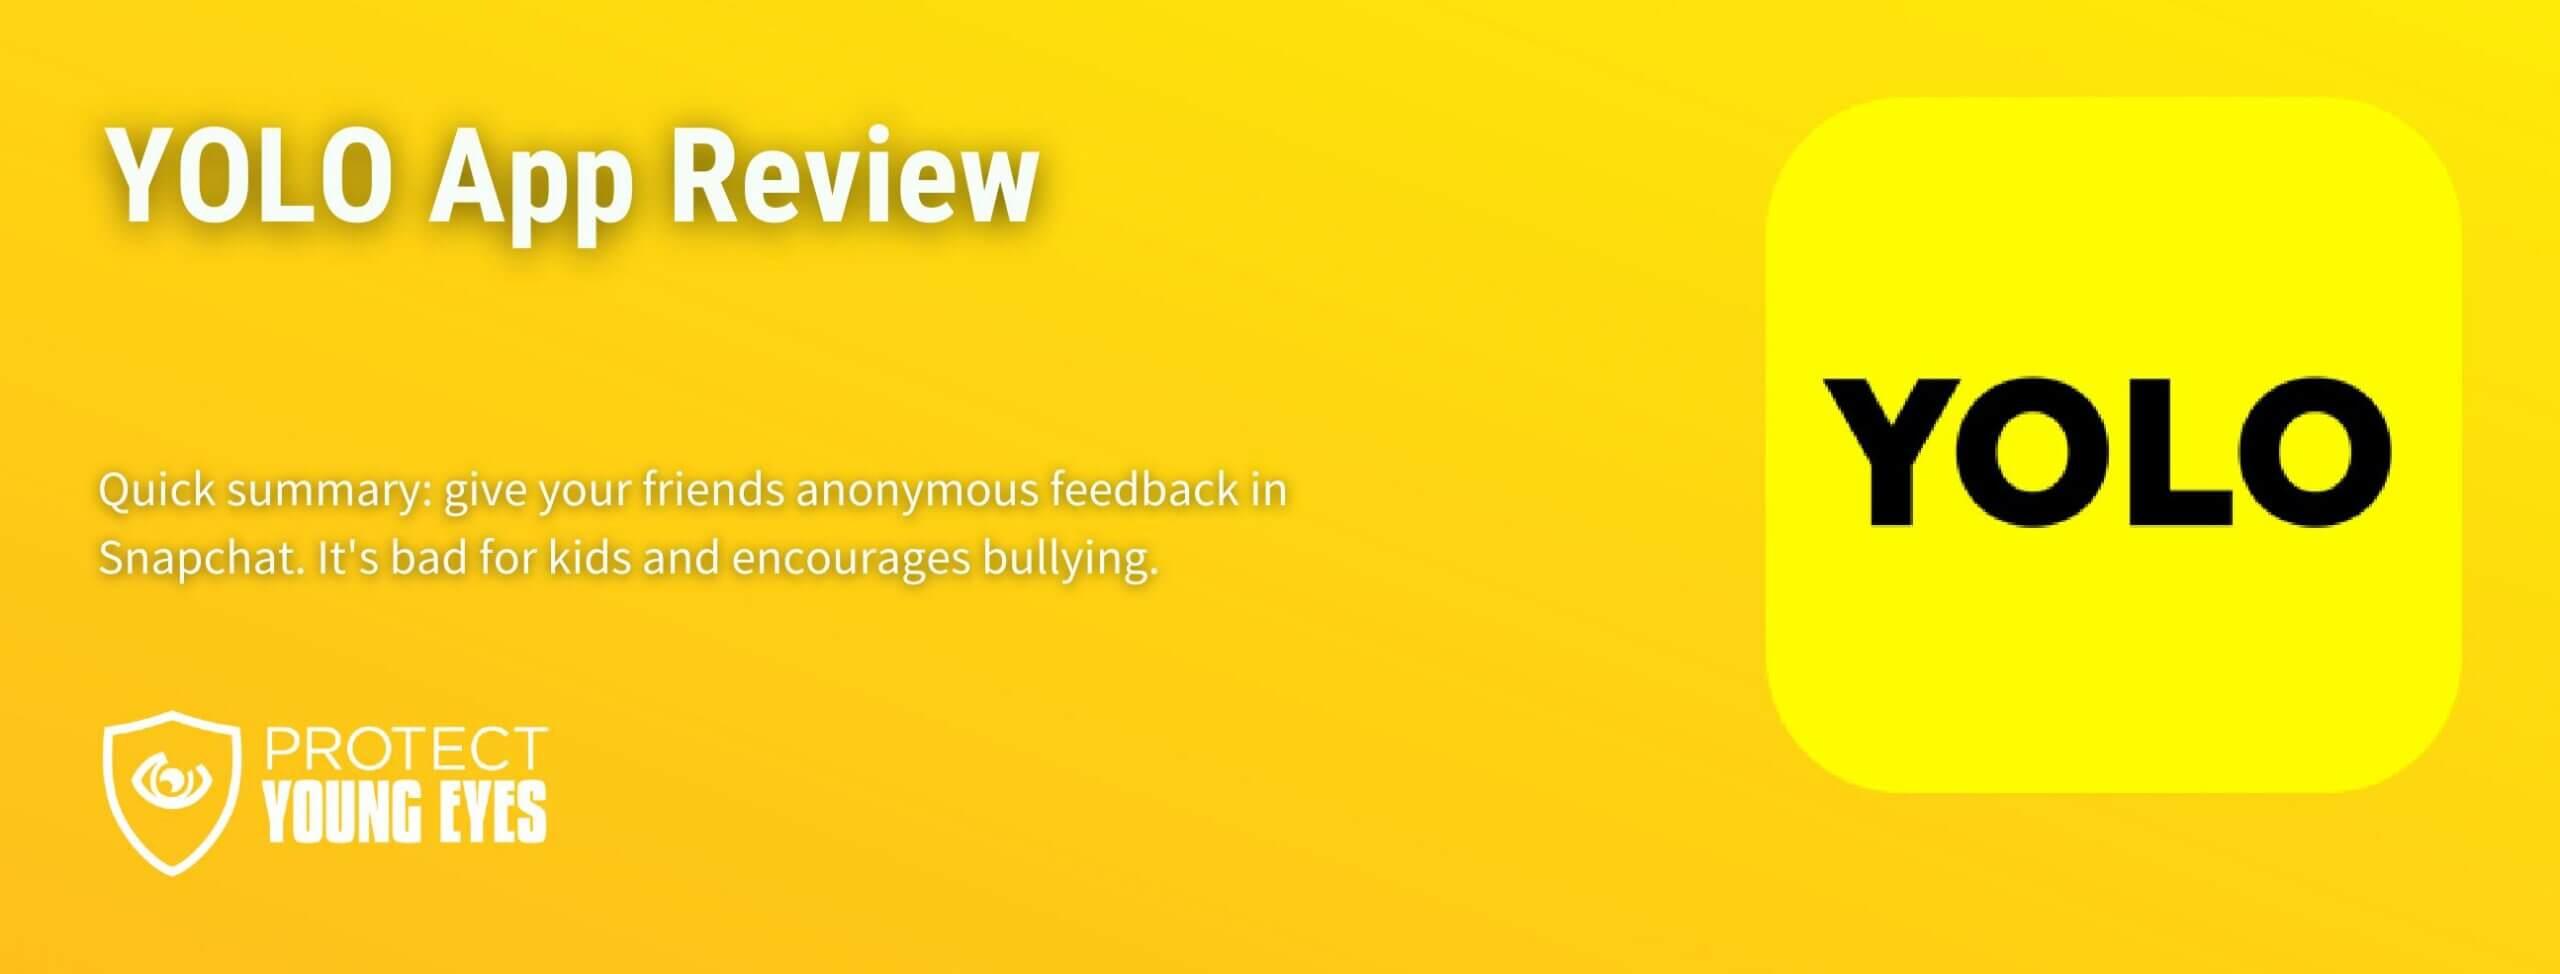 Yolo App Review for Parents - PYE